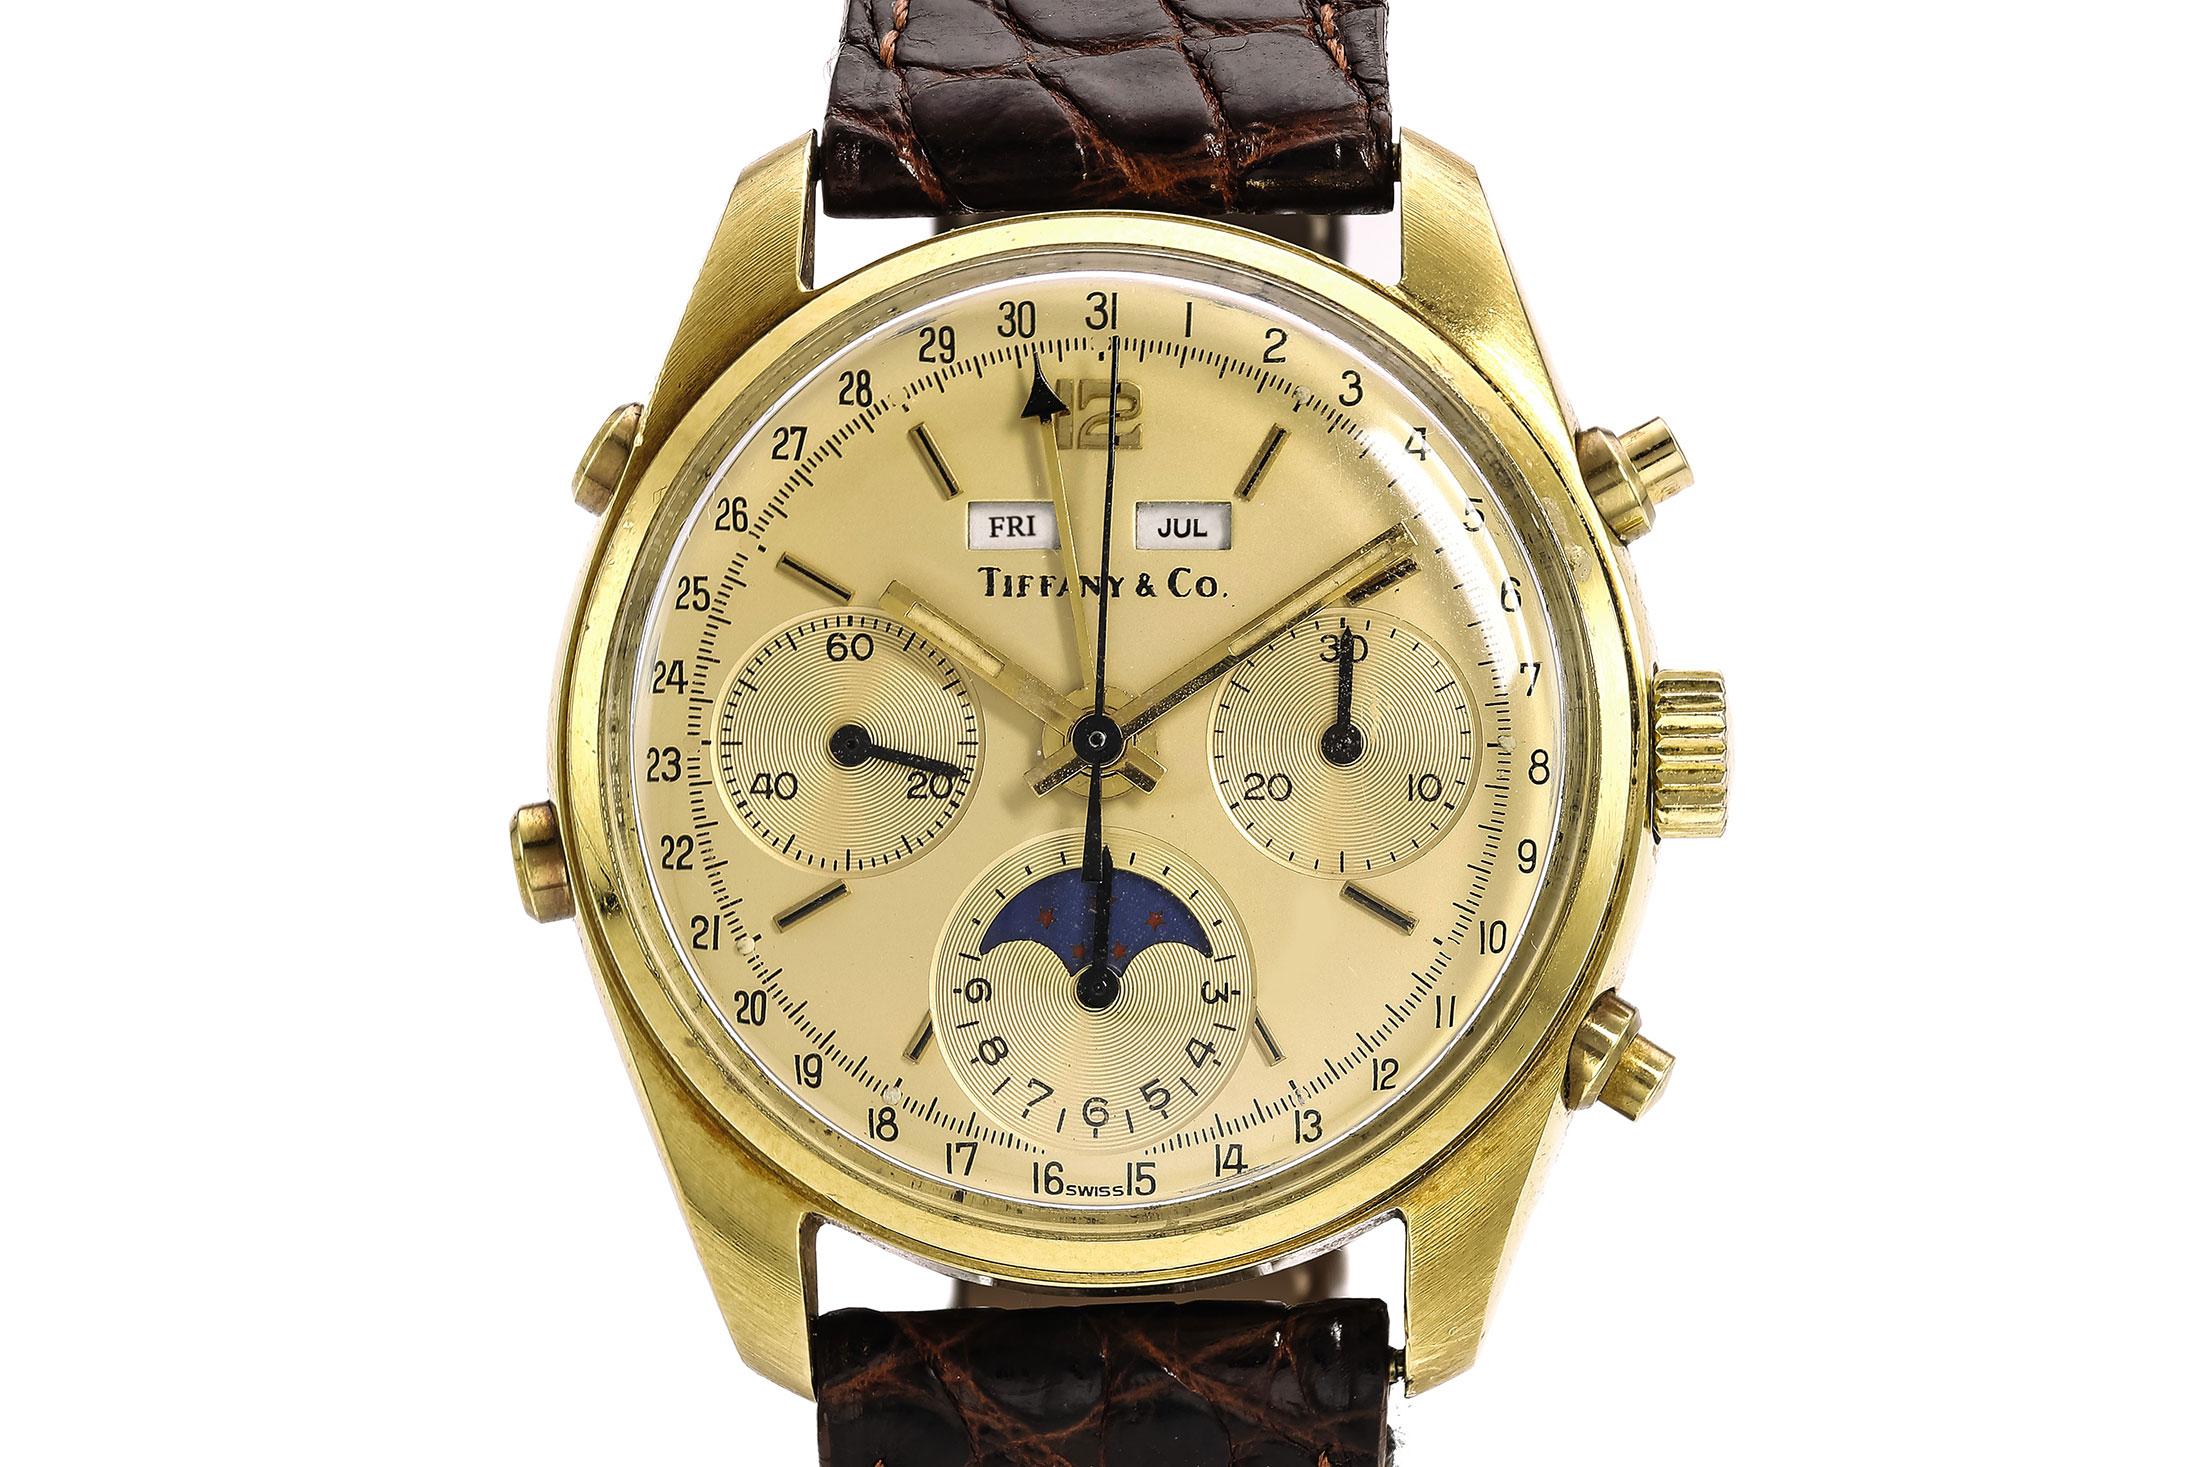 Tiffany & Co. Triple Calendar Chronograph (Lot )